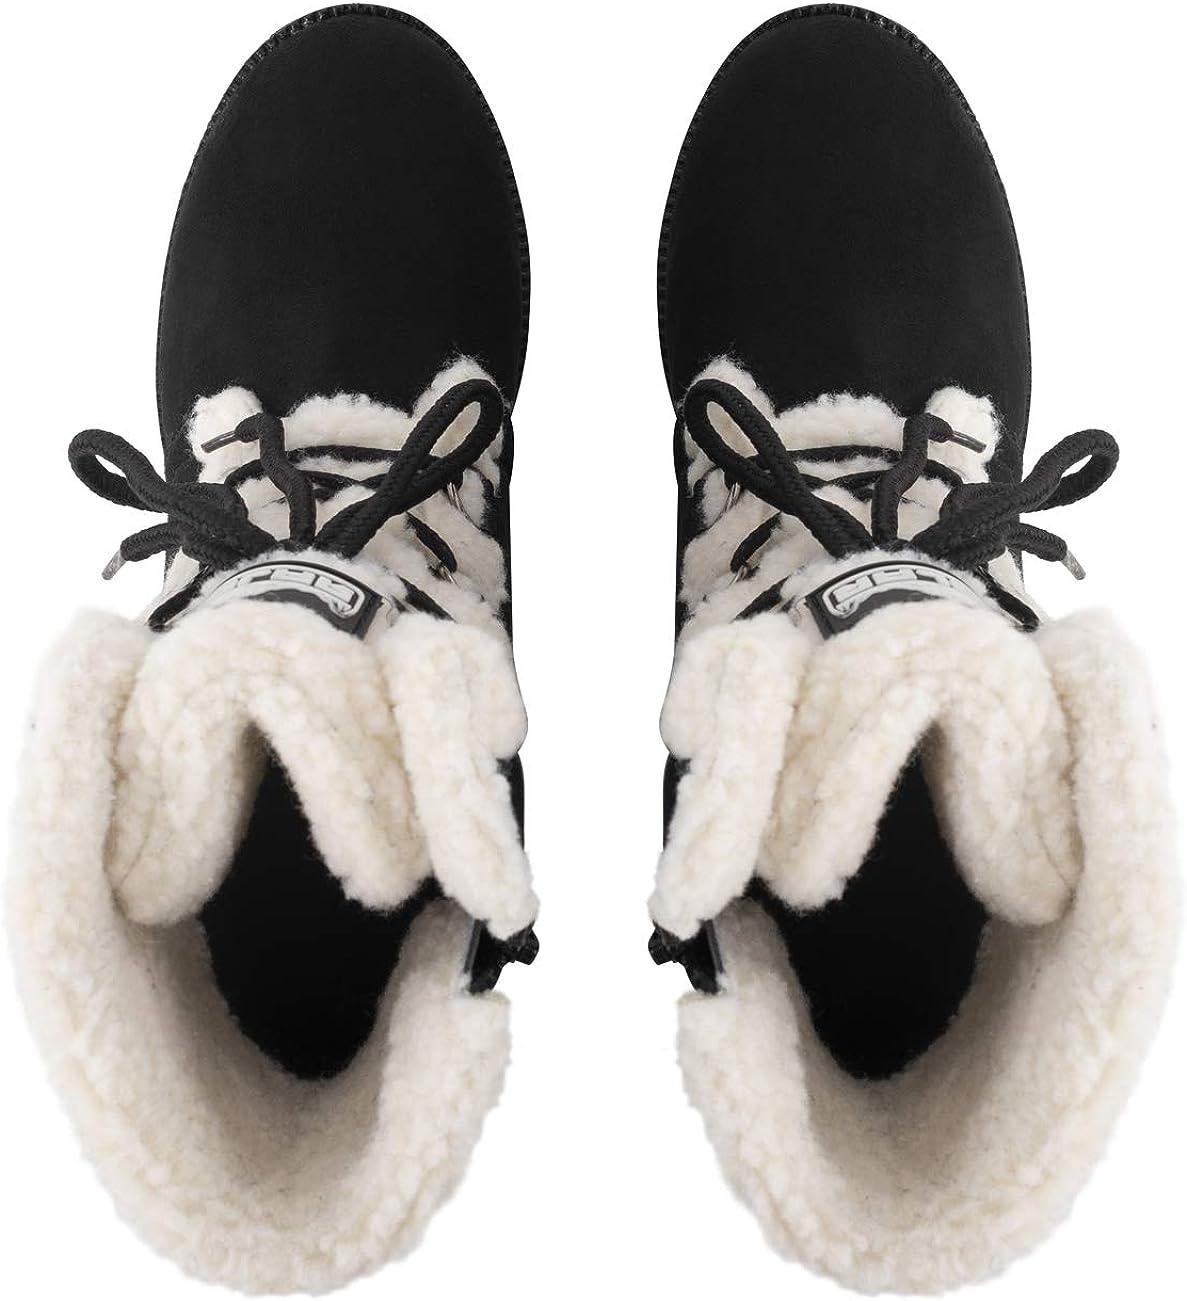 Polar Mujer Baja Tac/ón De Cu/ña Impermeable Invierno Nieve Durable Suela De Goma Ata para Arriba T/érmica Botas